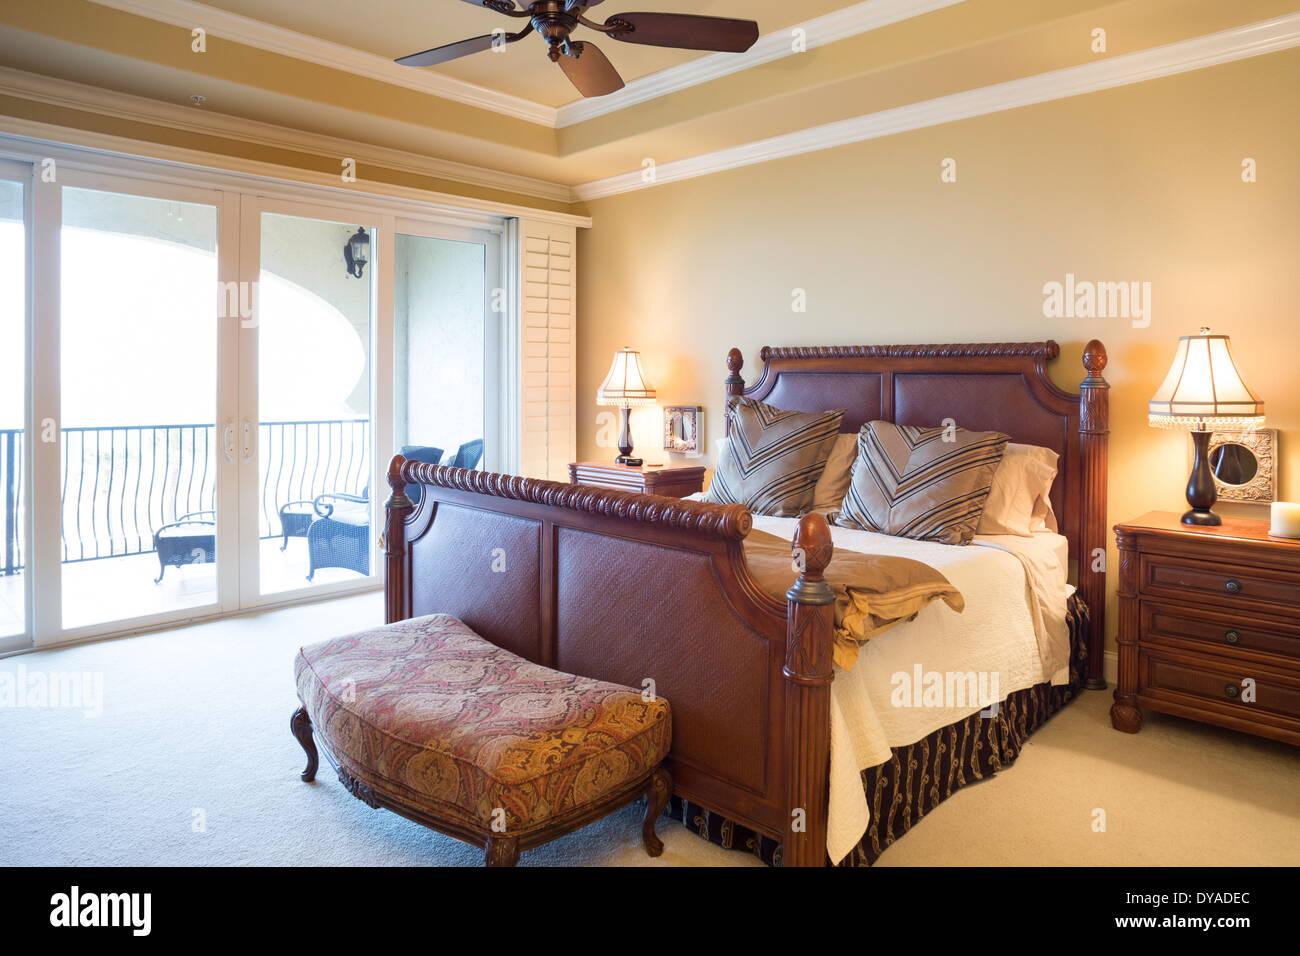 Luxury Master Bedroom With Sliding Glass Doors To Balcony Usa Stock Photo Alamy